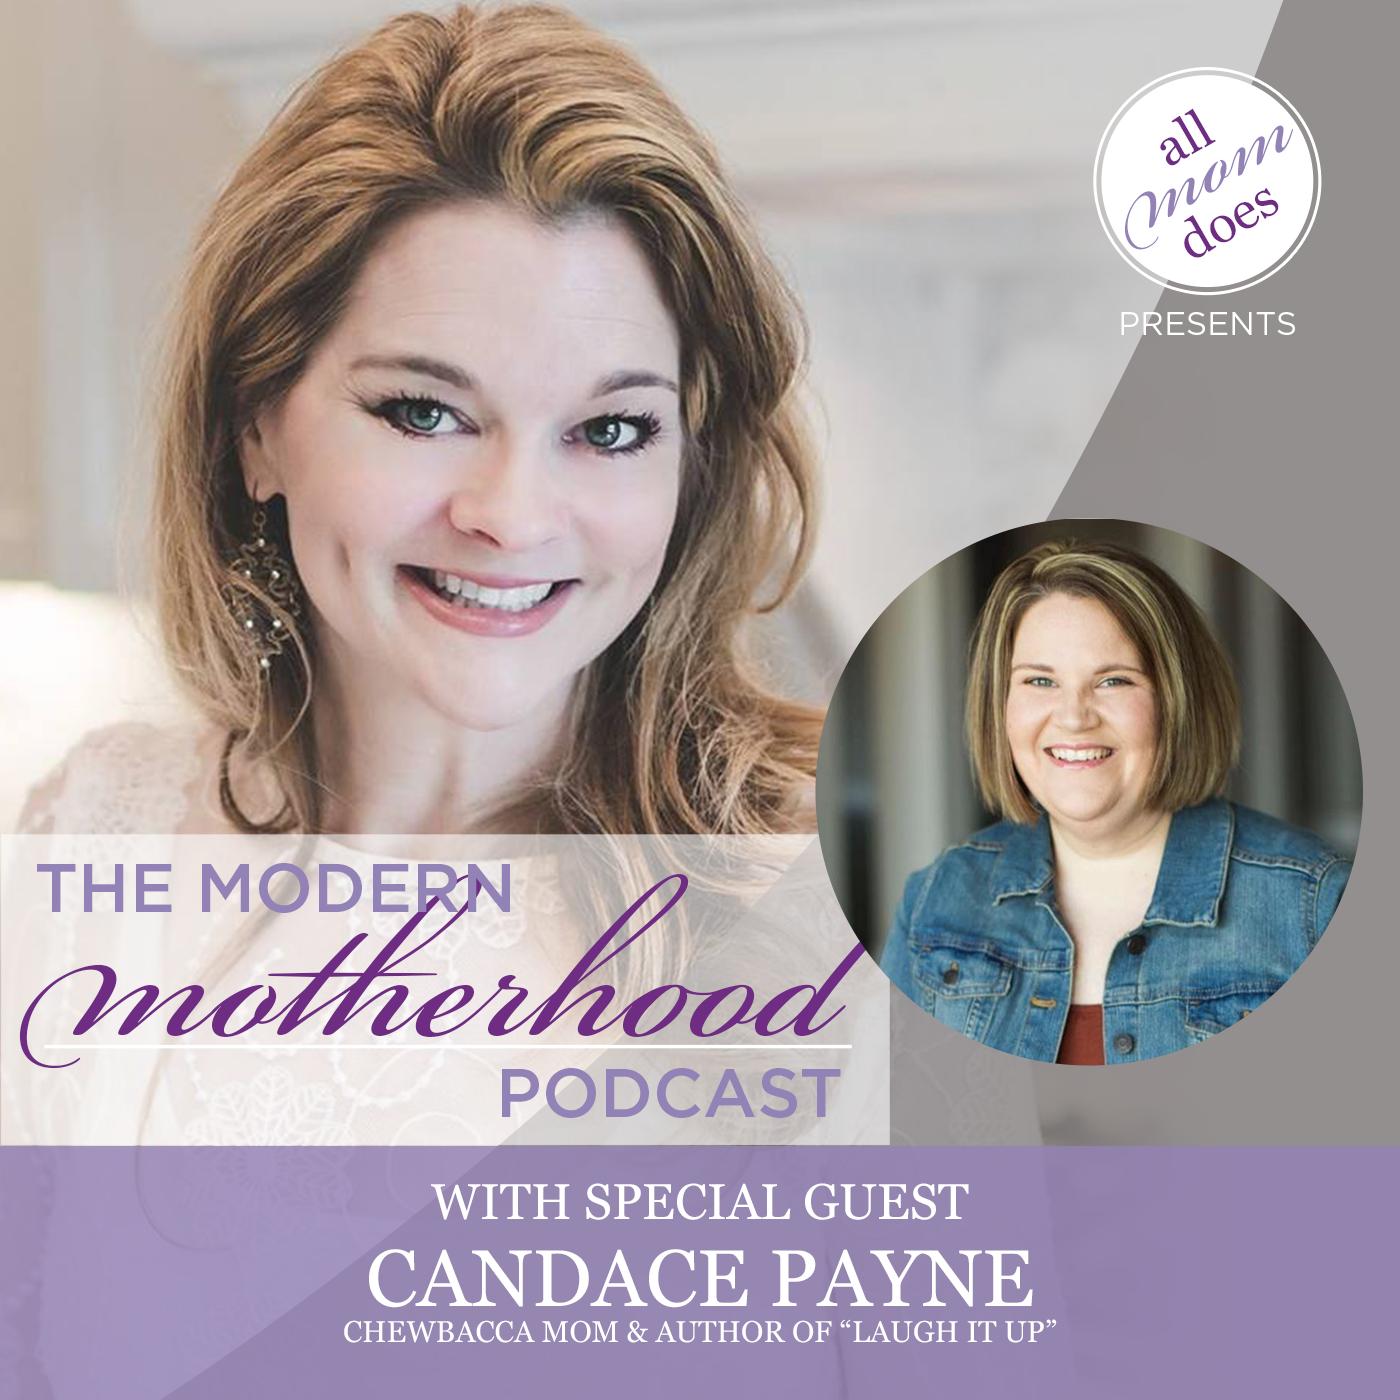 The Modern Motherhood Podcast #21: Candace Payne